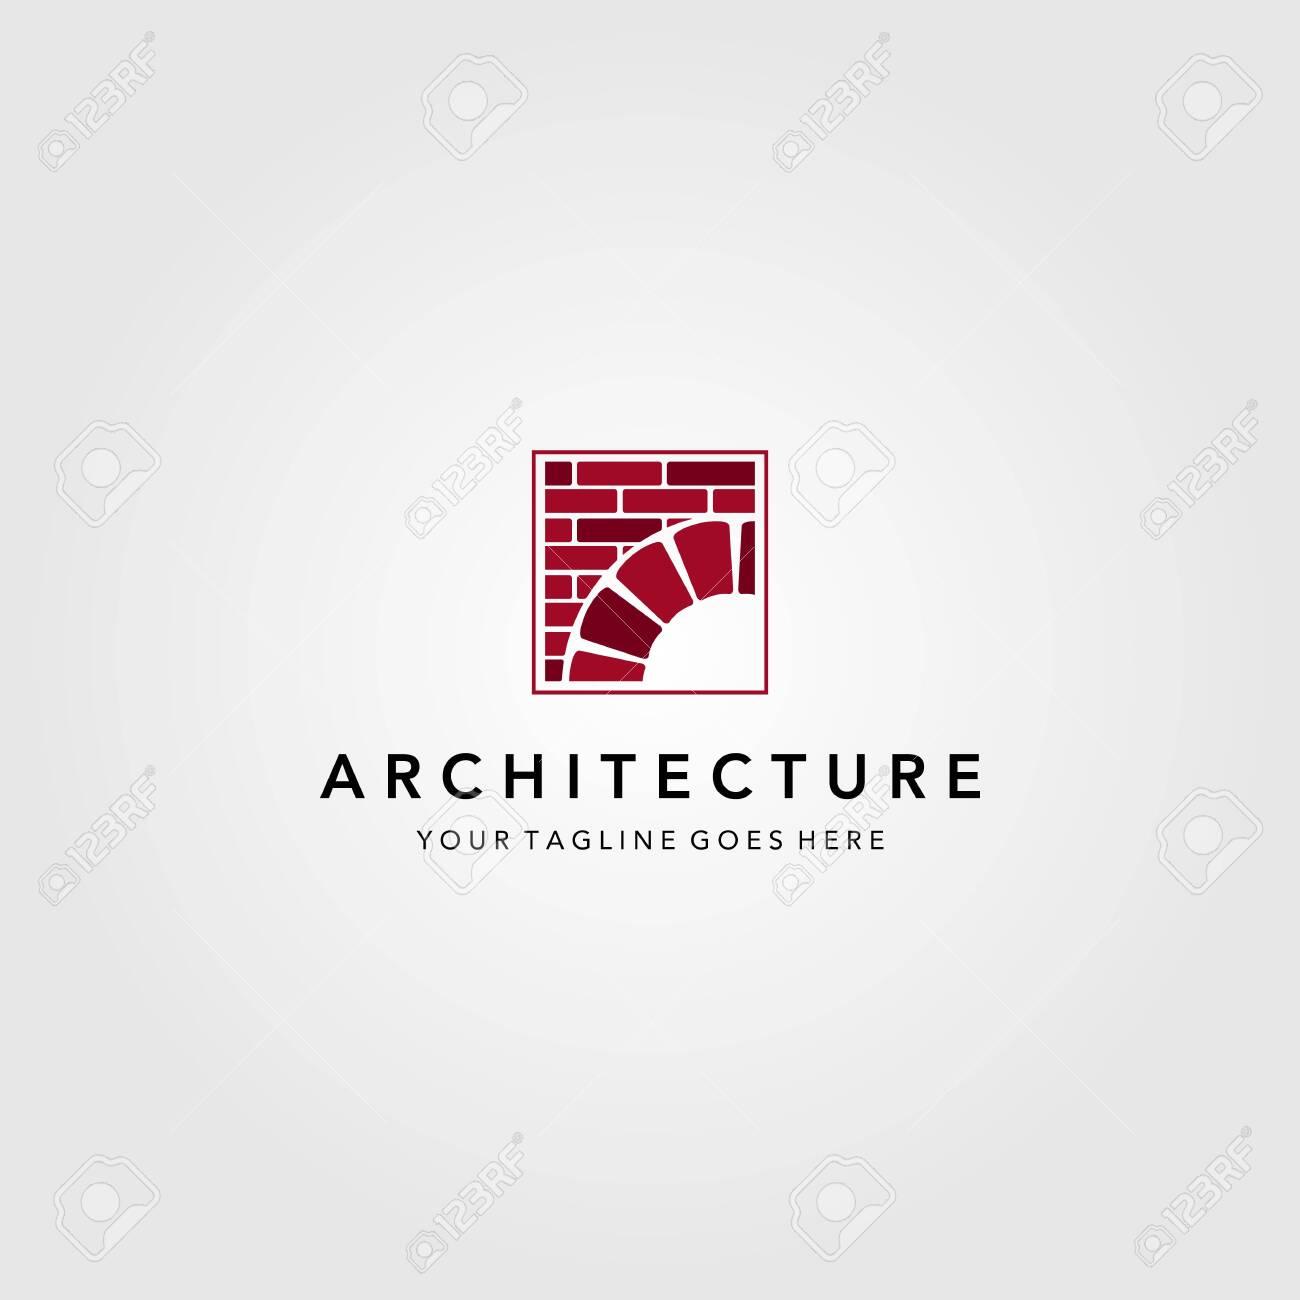 vintage bridge logo construction brick vector emblem illustration design - 146209474